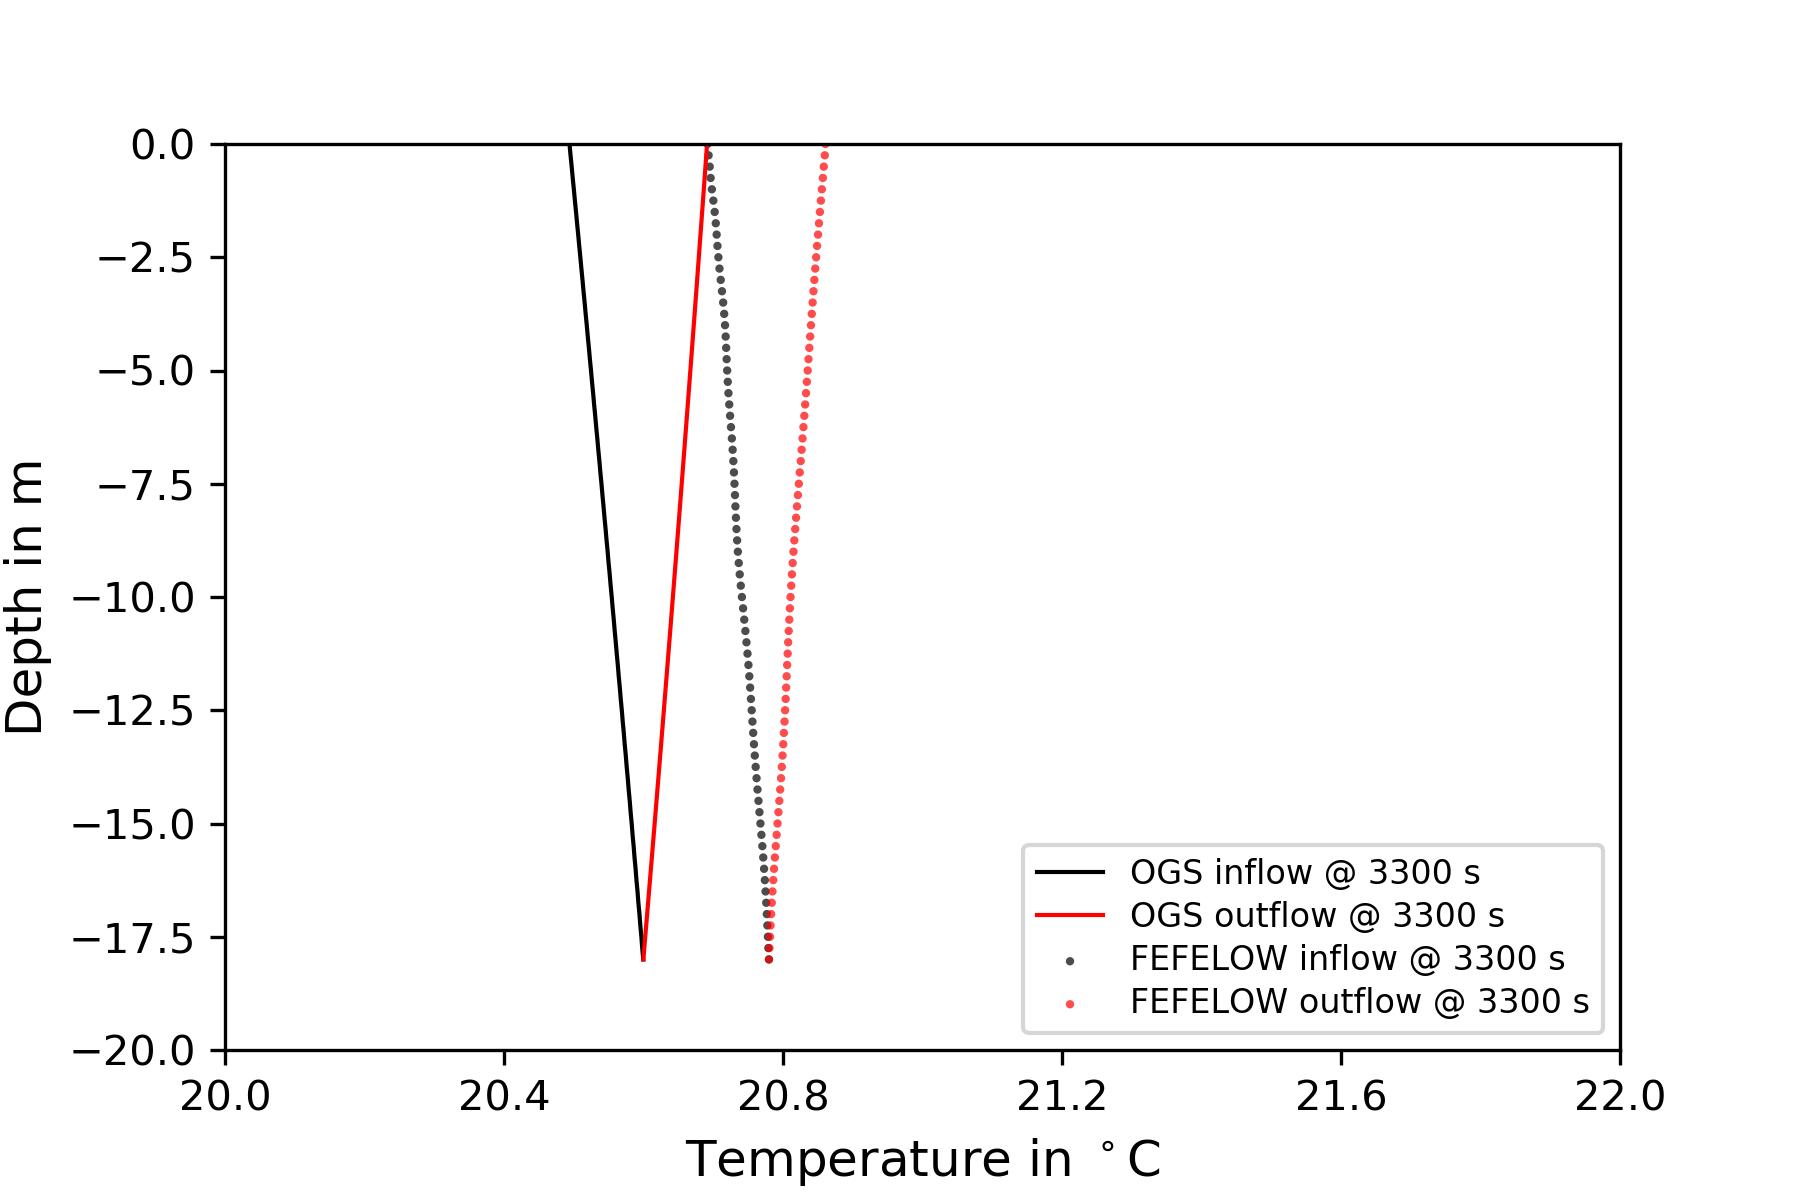 web/content/docs/benchmarks/heat-transport-bhe/3D_2U_BHE_figures/vertical_temperature_distribution_powerBC.png